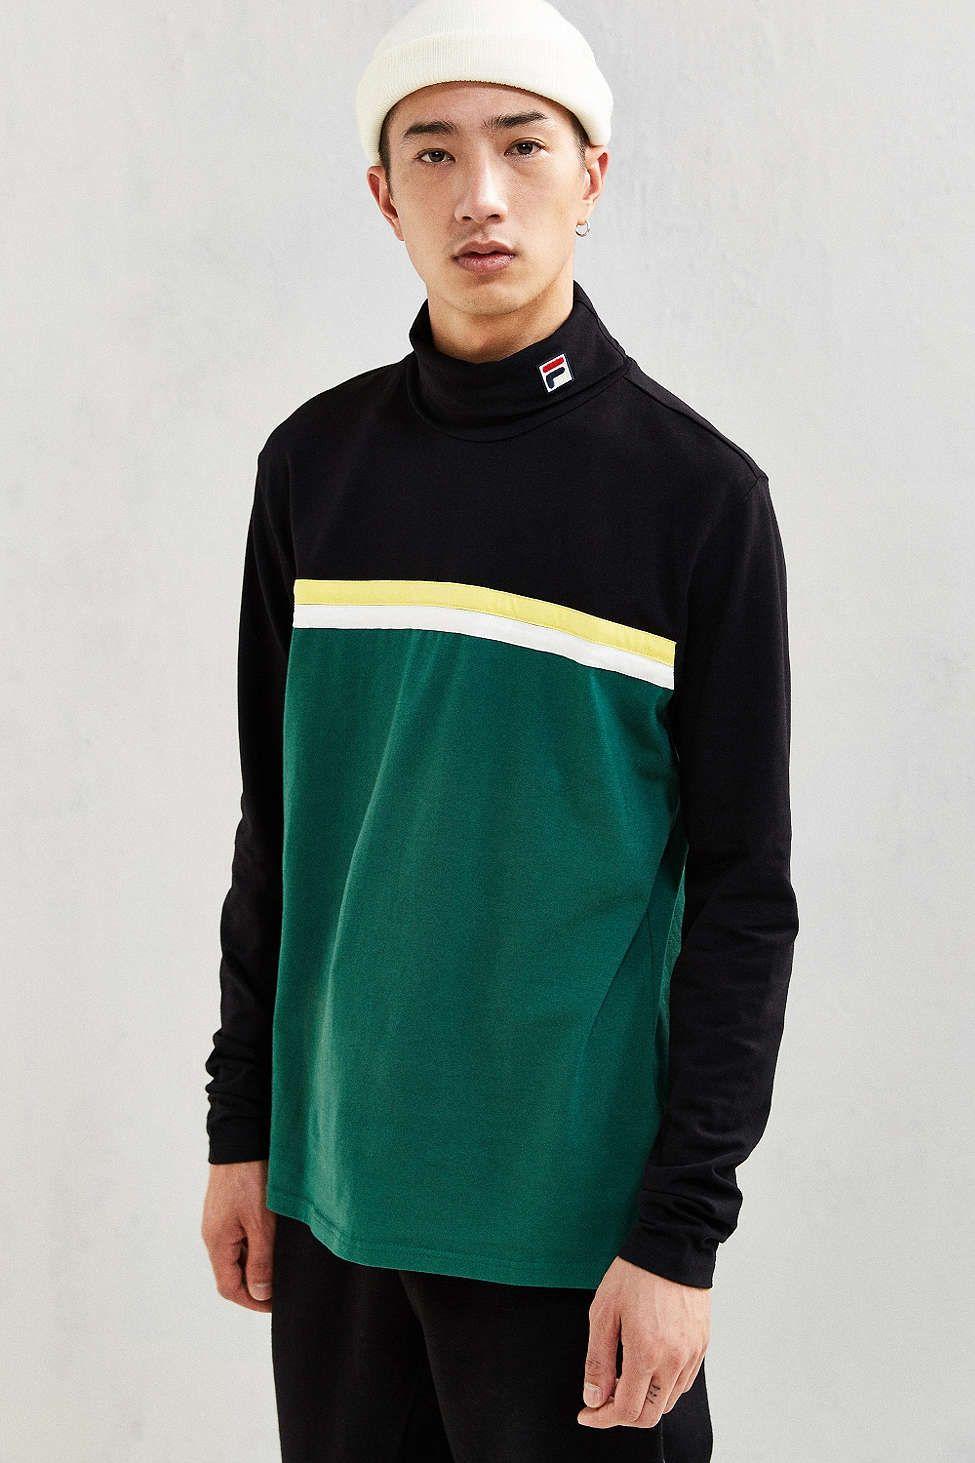 dcf9a9b8dce FILA Bormino Turtleneck Shirt - Urban Outfitters